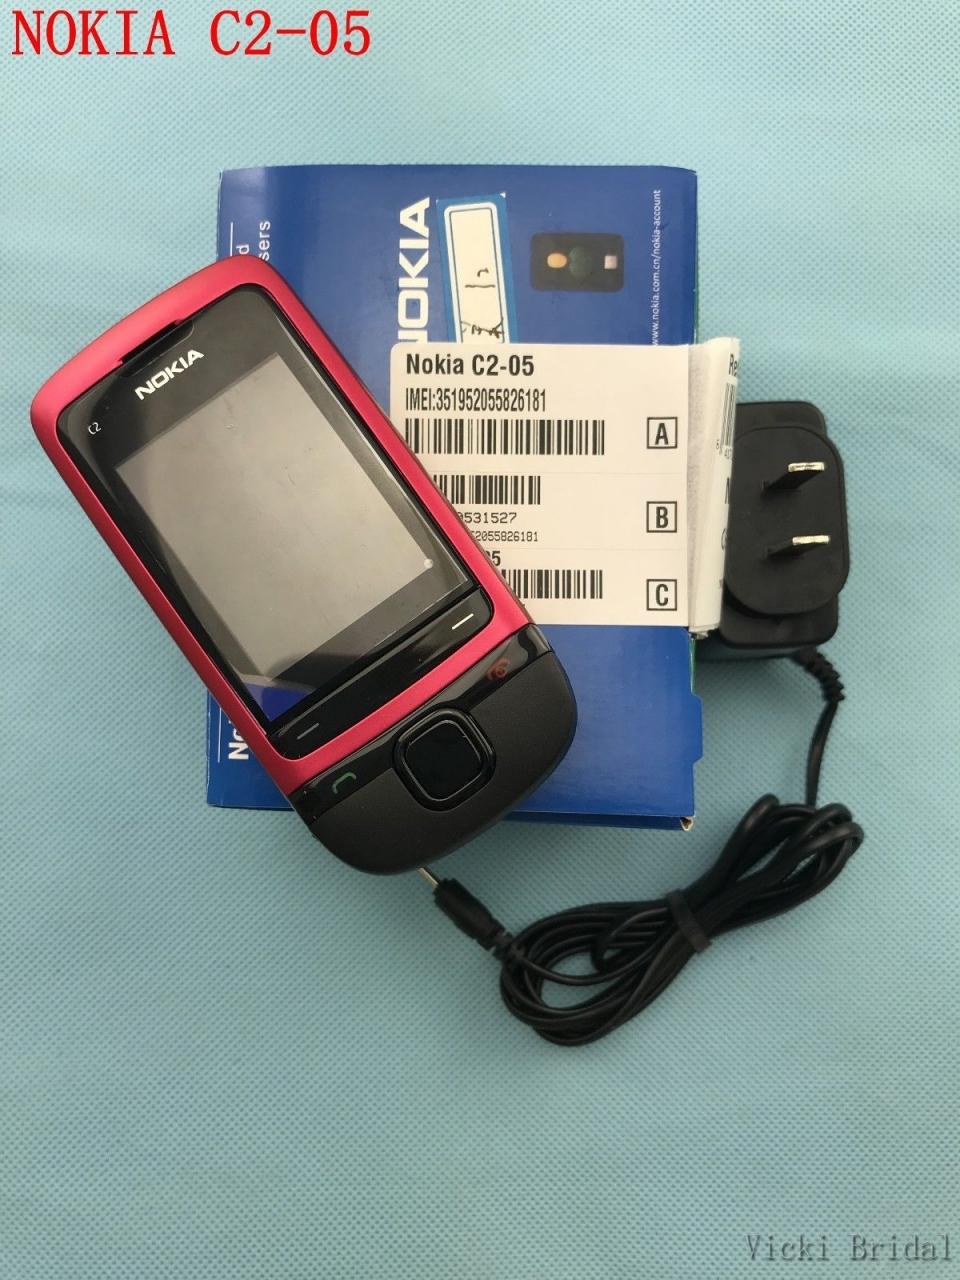 Refurbished phone Original Unlocked Nokia C2-05 slide cell phone Bluetooth phone black 1